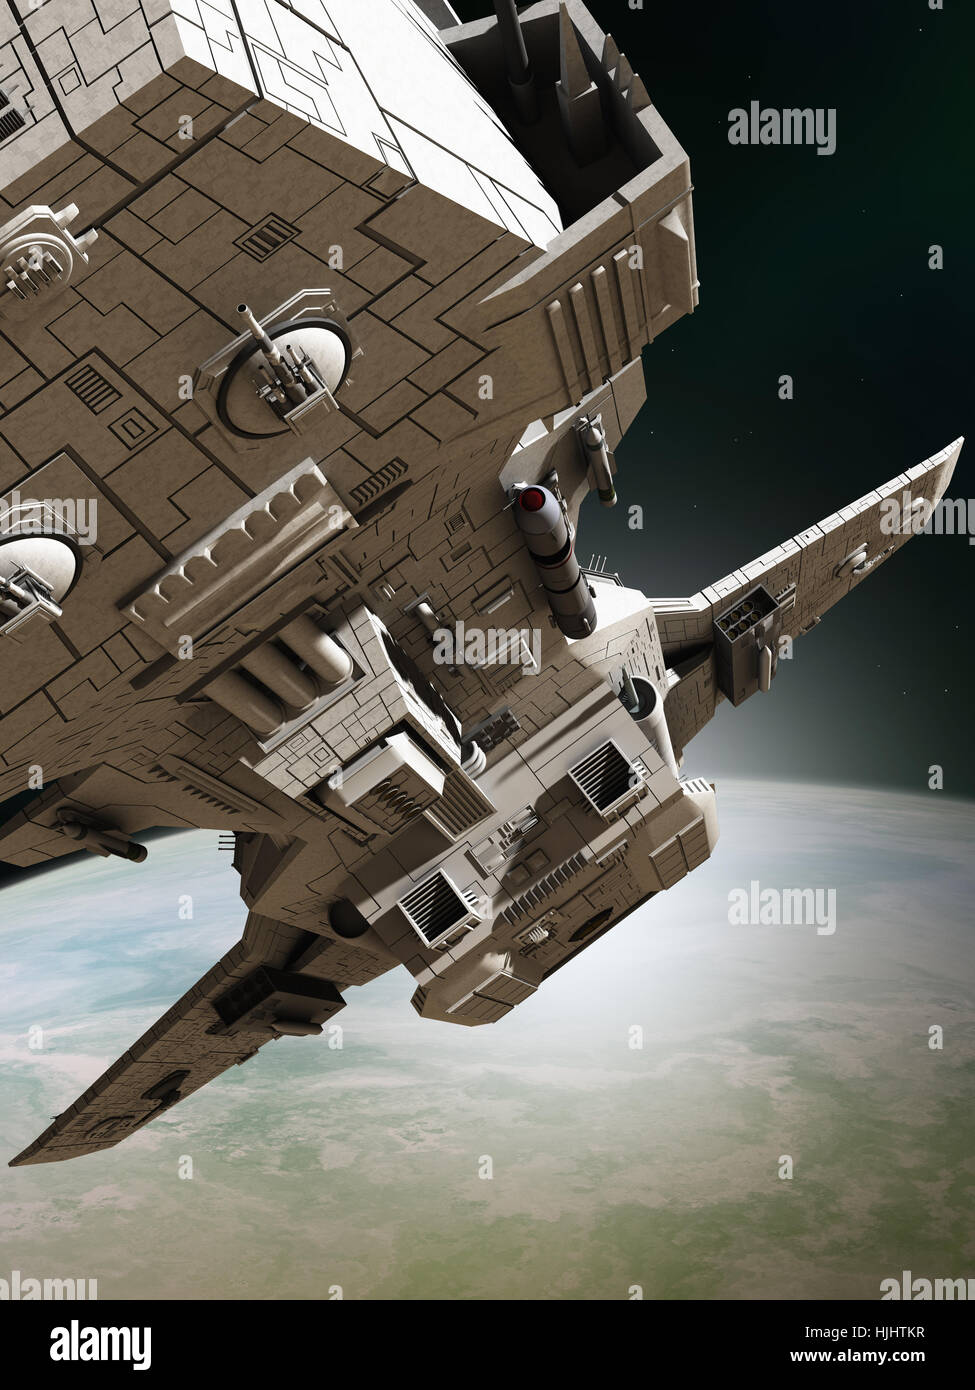 Interplanetary Spaceship Leaving Orbit, Close View - science fiction illustration - Stock Image